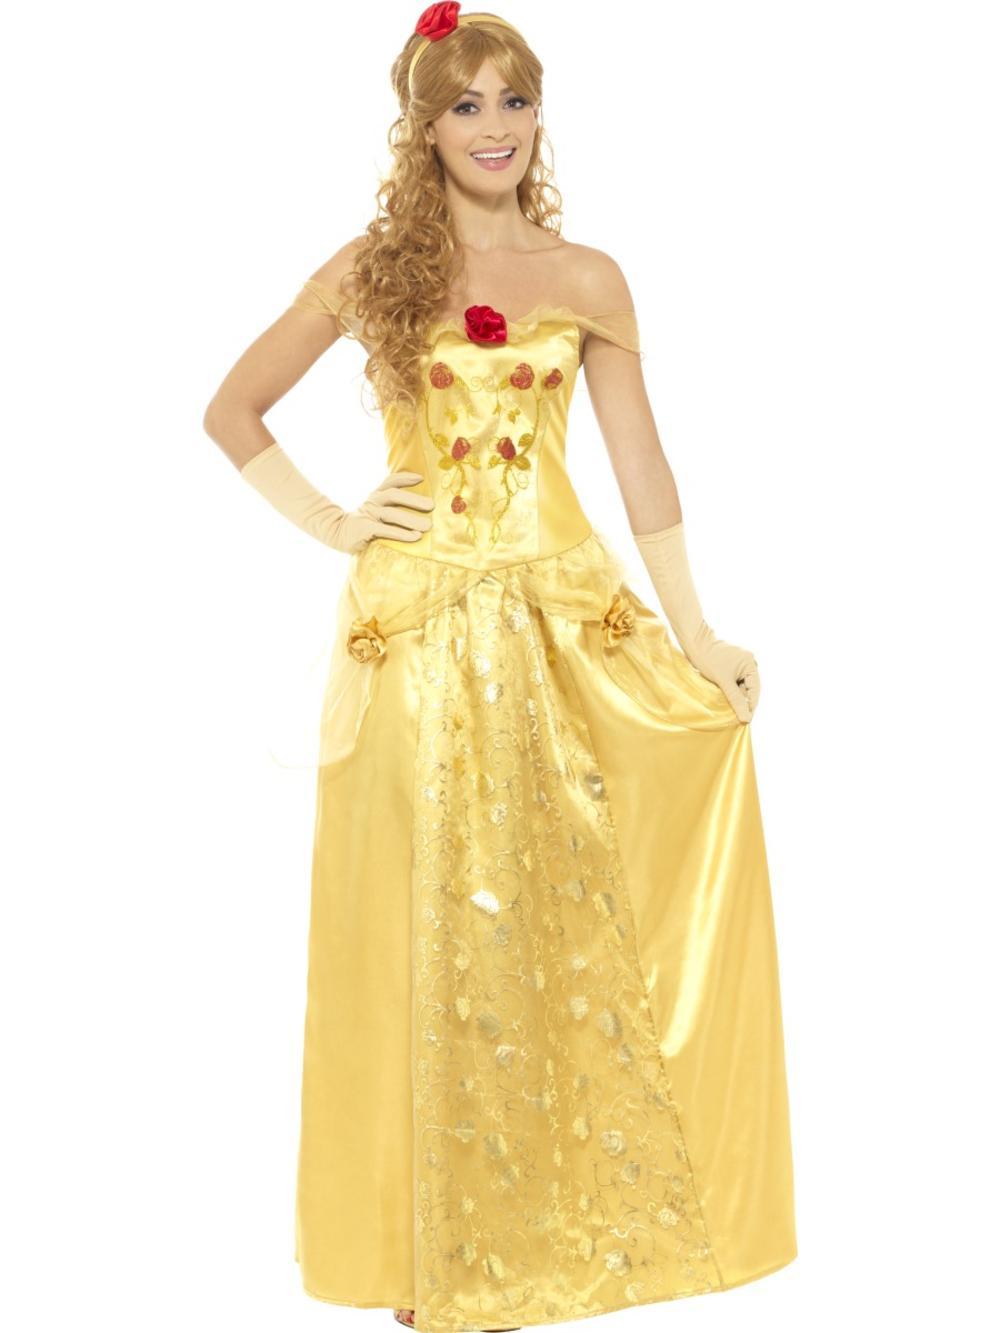 Golden Beauty Princess Ladies Fancy Dress Belle Fairytale Book Day Adult Costume